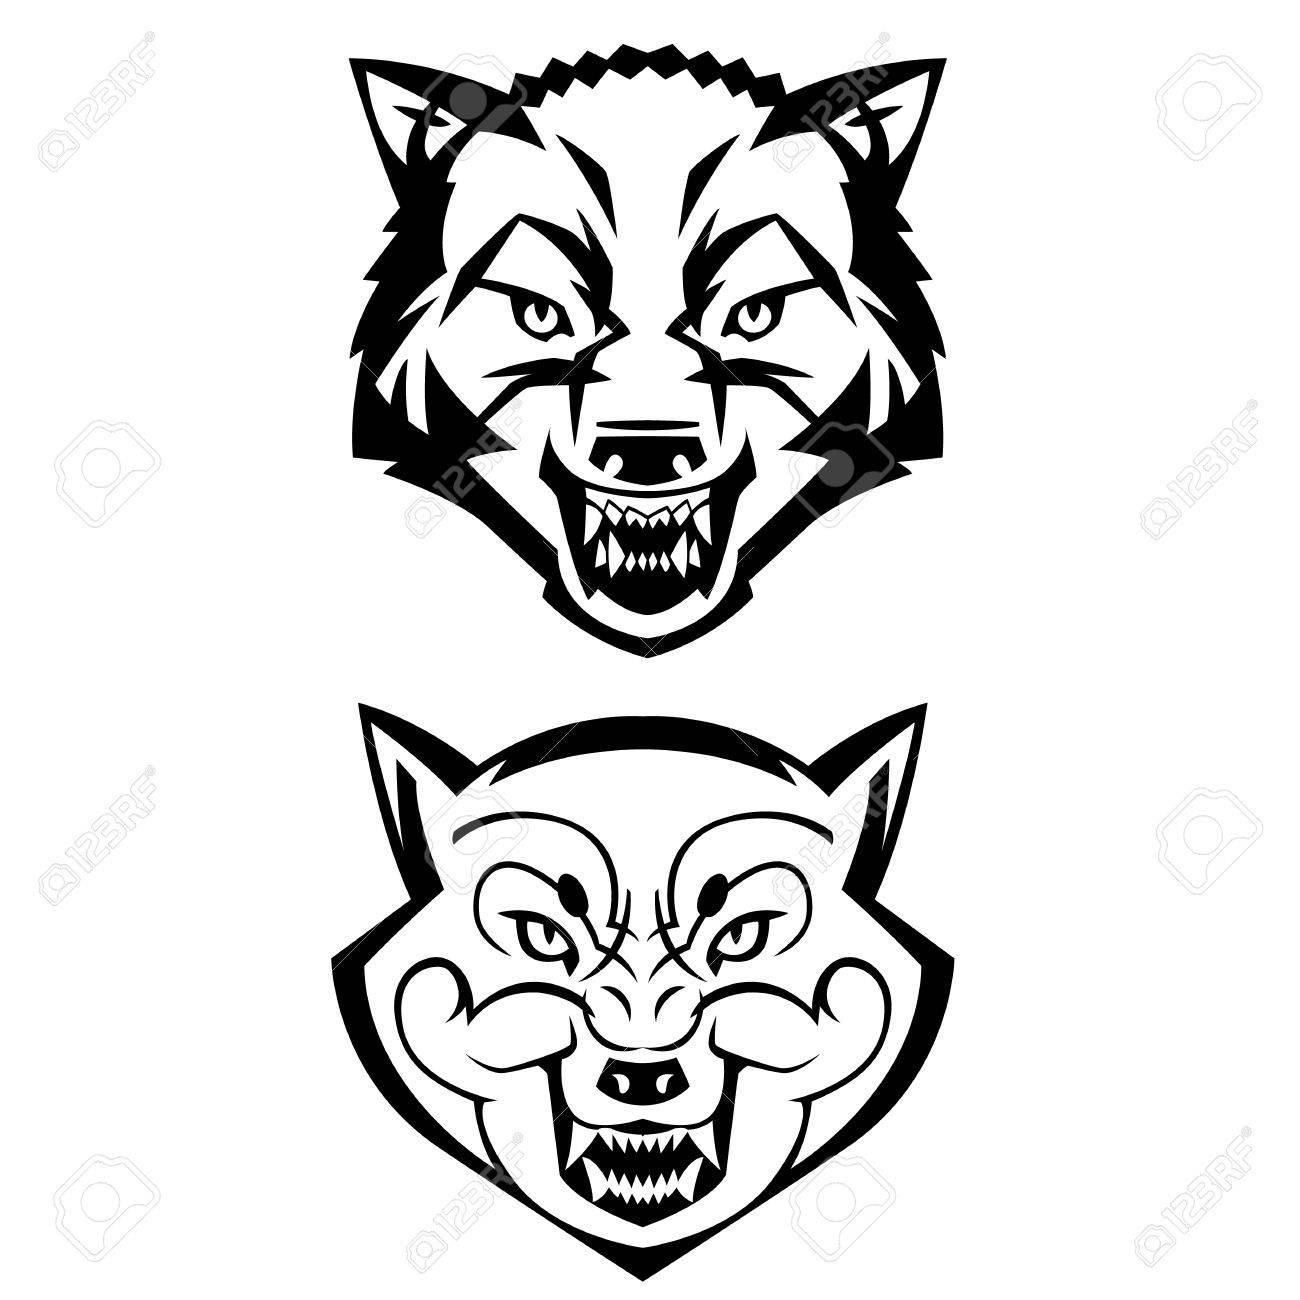 wolfs heads showing teeth harsh beast hunter forest vector can vector wolfs heads showing teeth harsh beast hunter forest vector can be used as a tattoo or logo